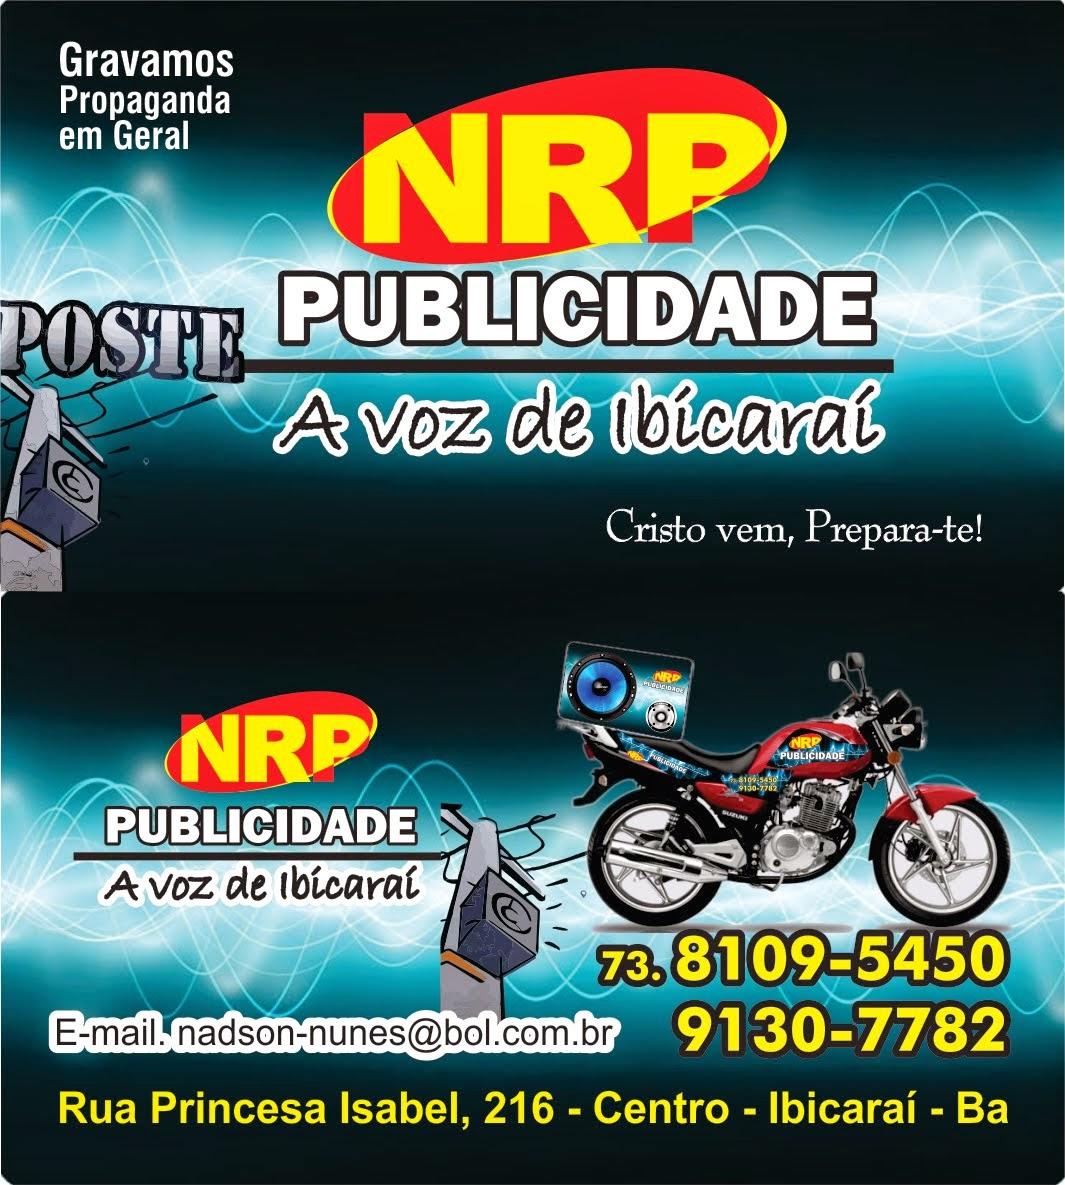 NRP Publicidade